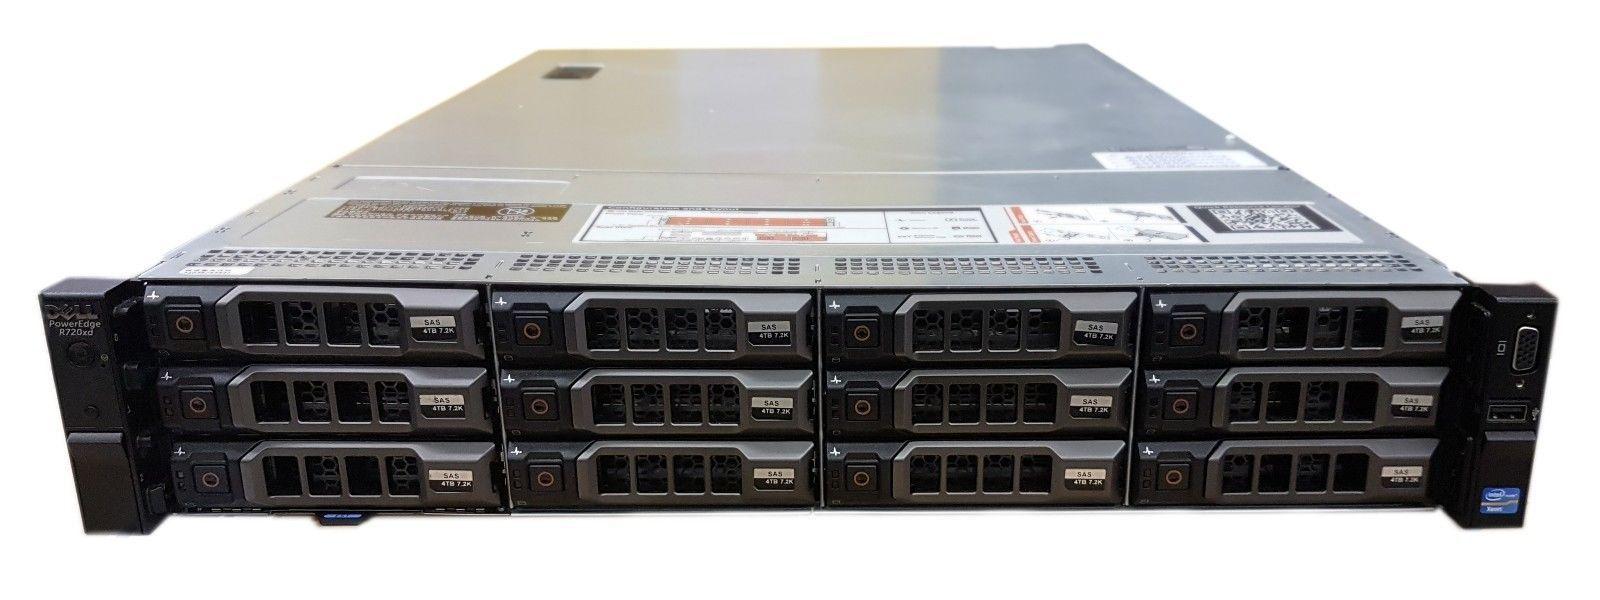 Сервер (б/у) DELL PowerEdge R720xd CPU 2х Intel Xeon E5-2630v2 2.6GHz-3.10GHz (6 cores, 12 threads, 15M Cache)